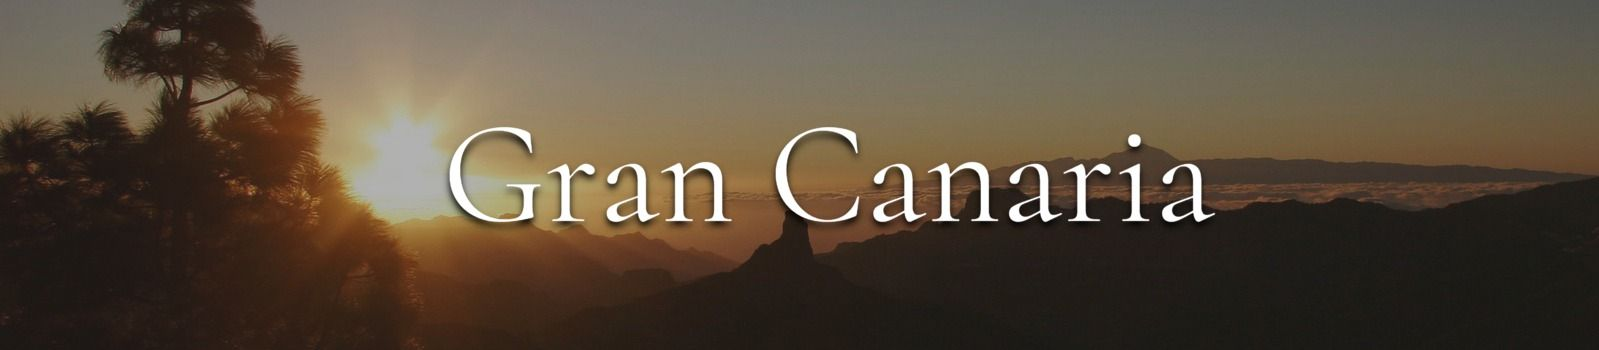 Gran Canaria Banner